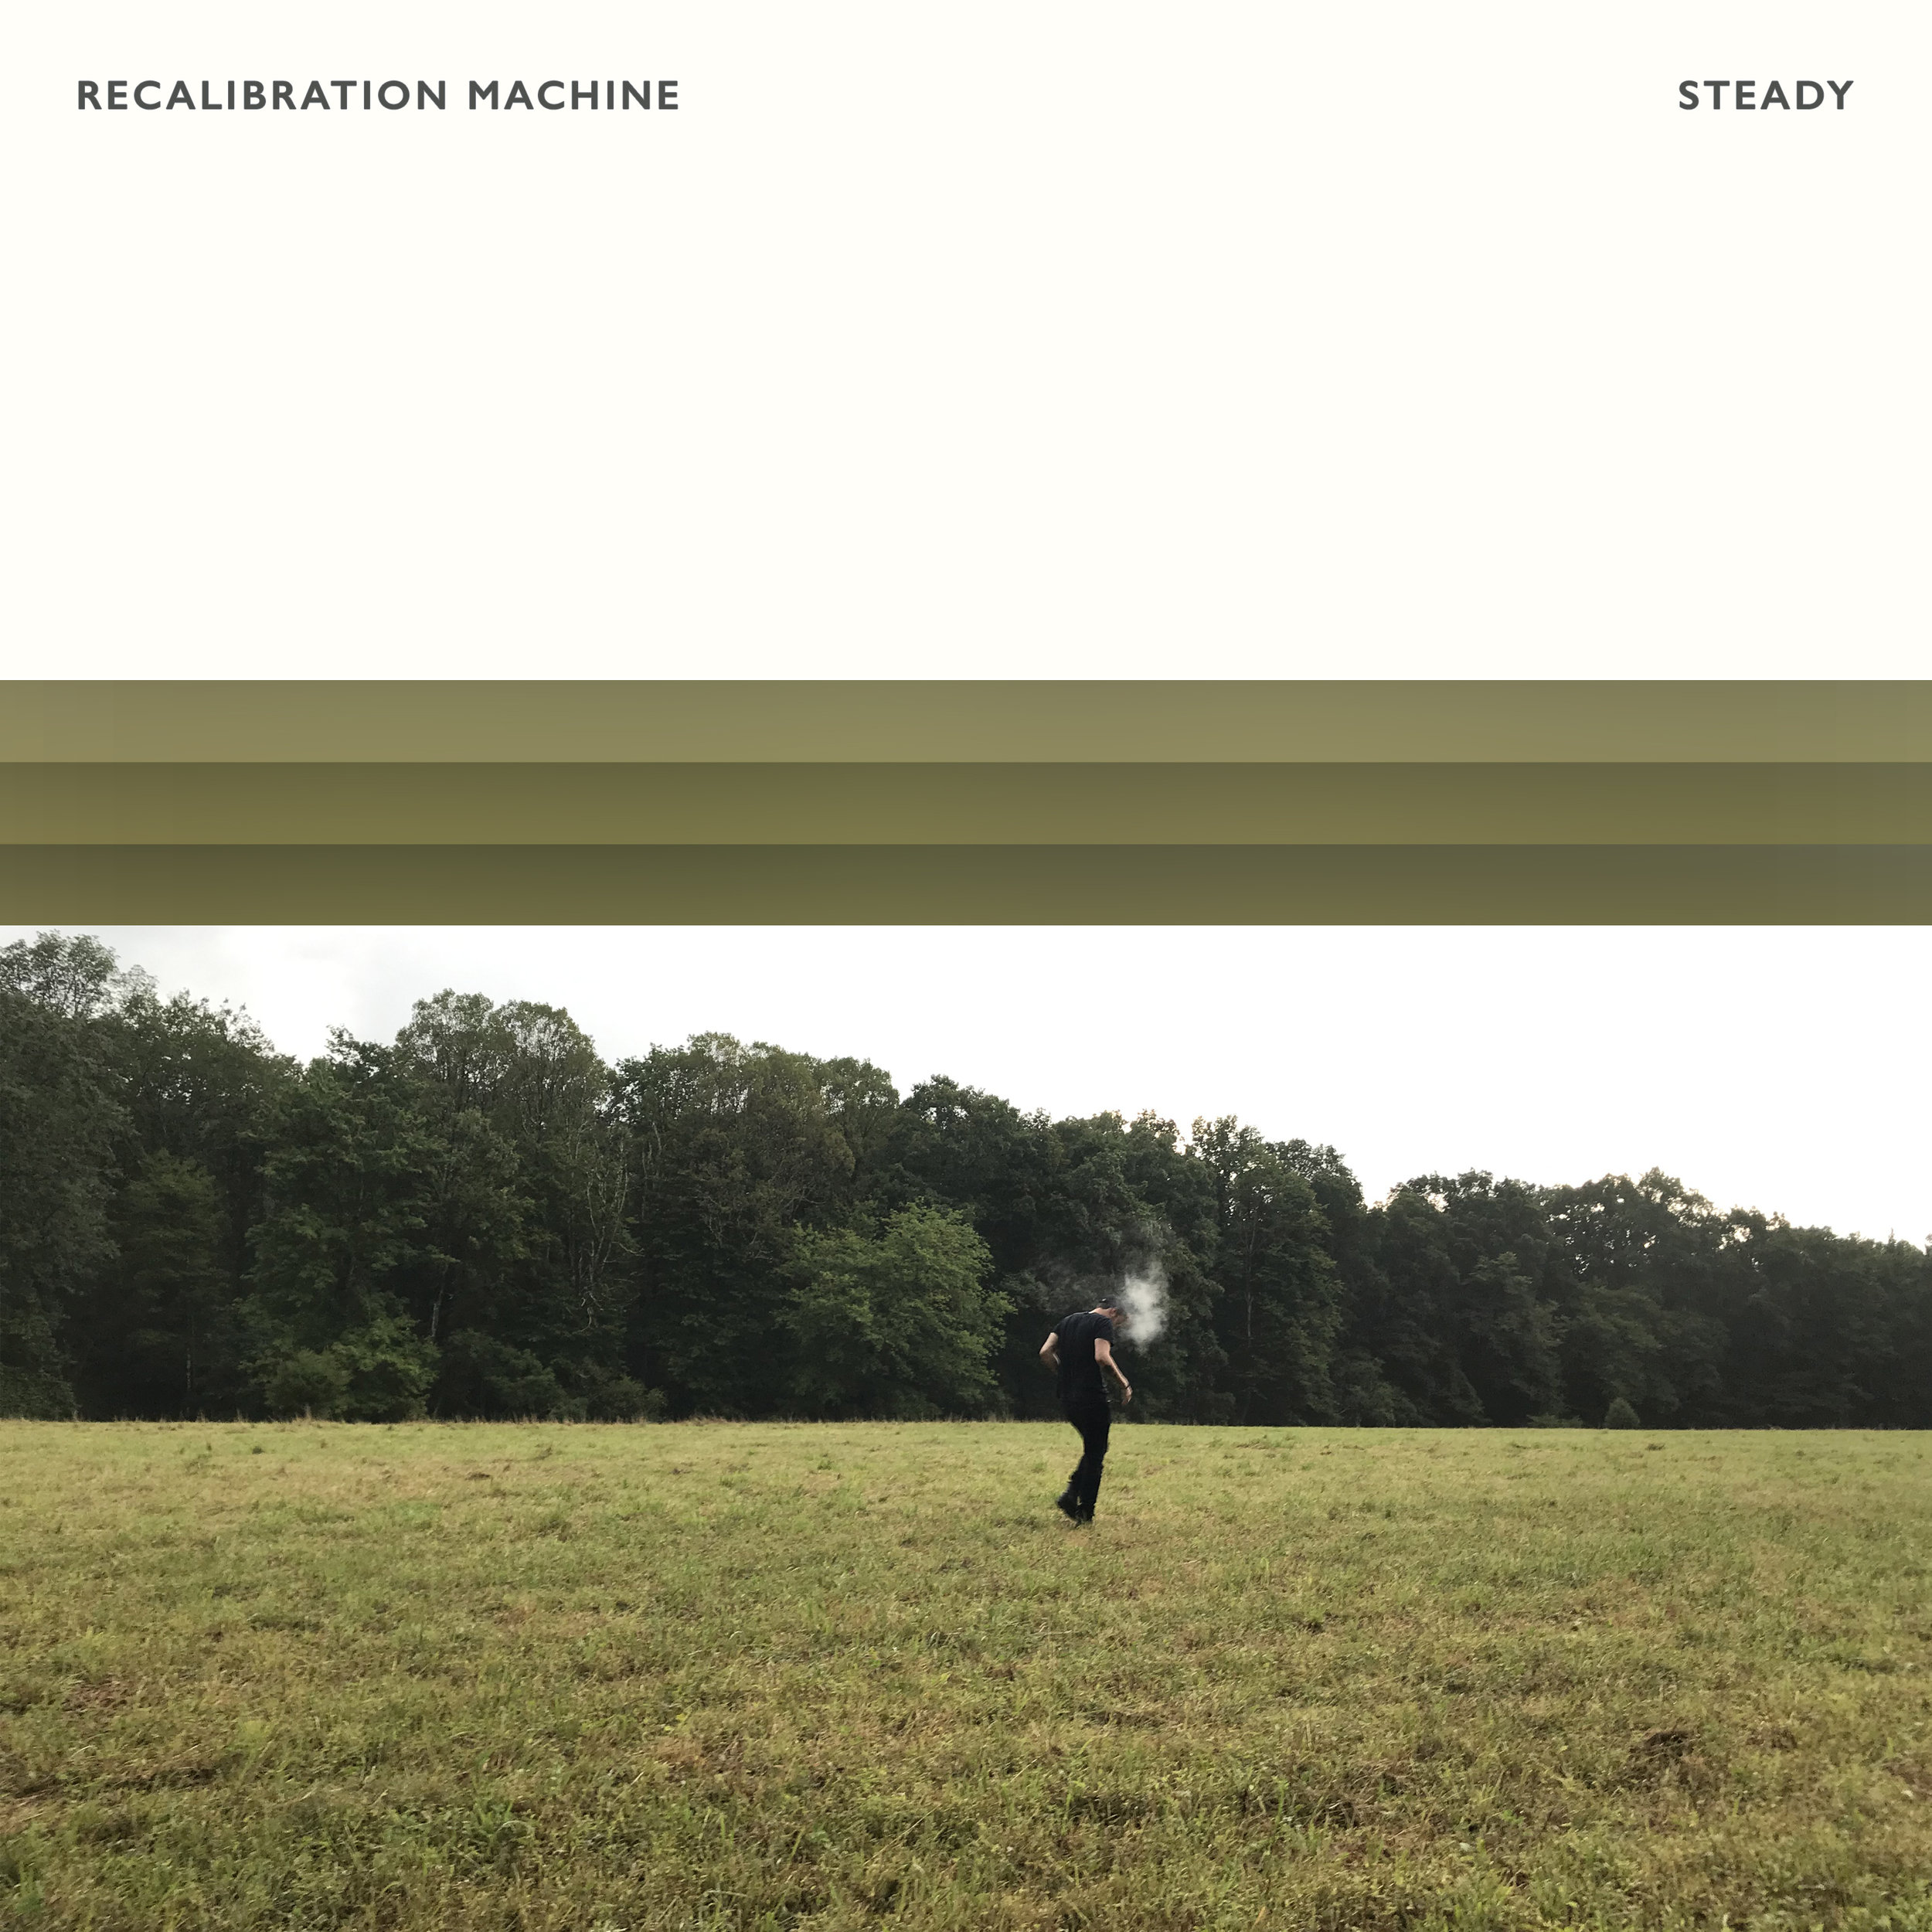 Recalibration Machine - Steady